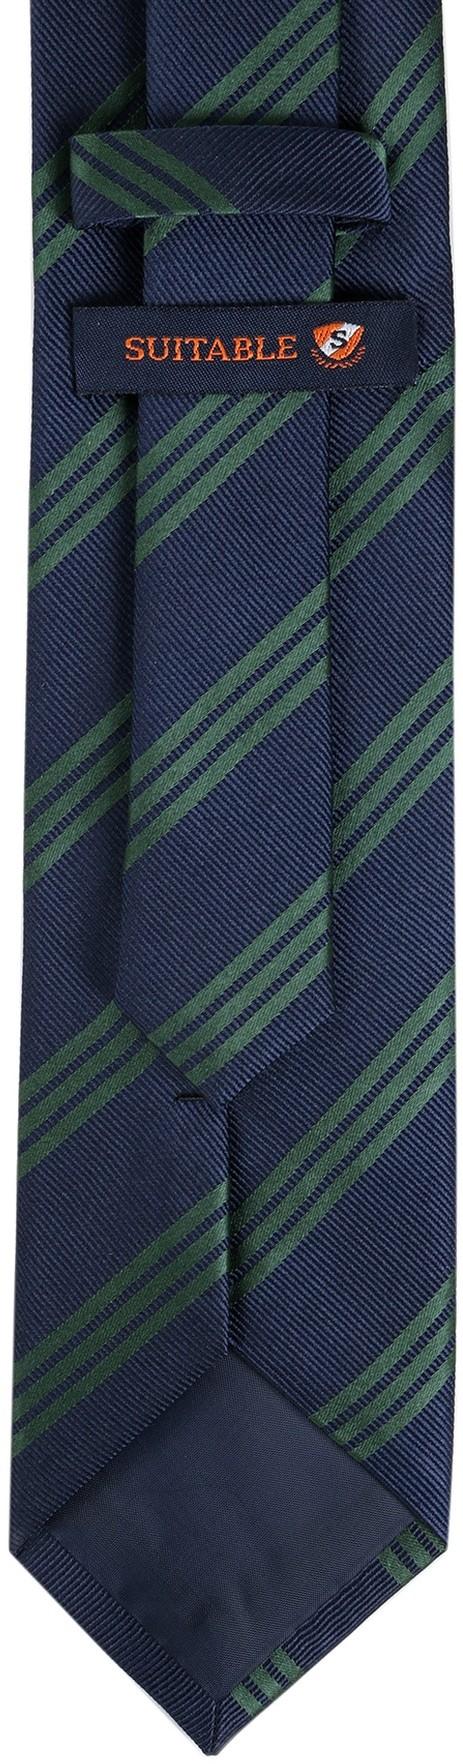 Krawatte Seide Streifen Navy Grun foto 3